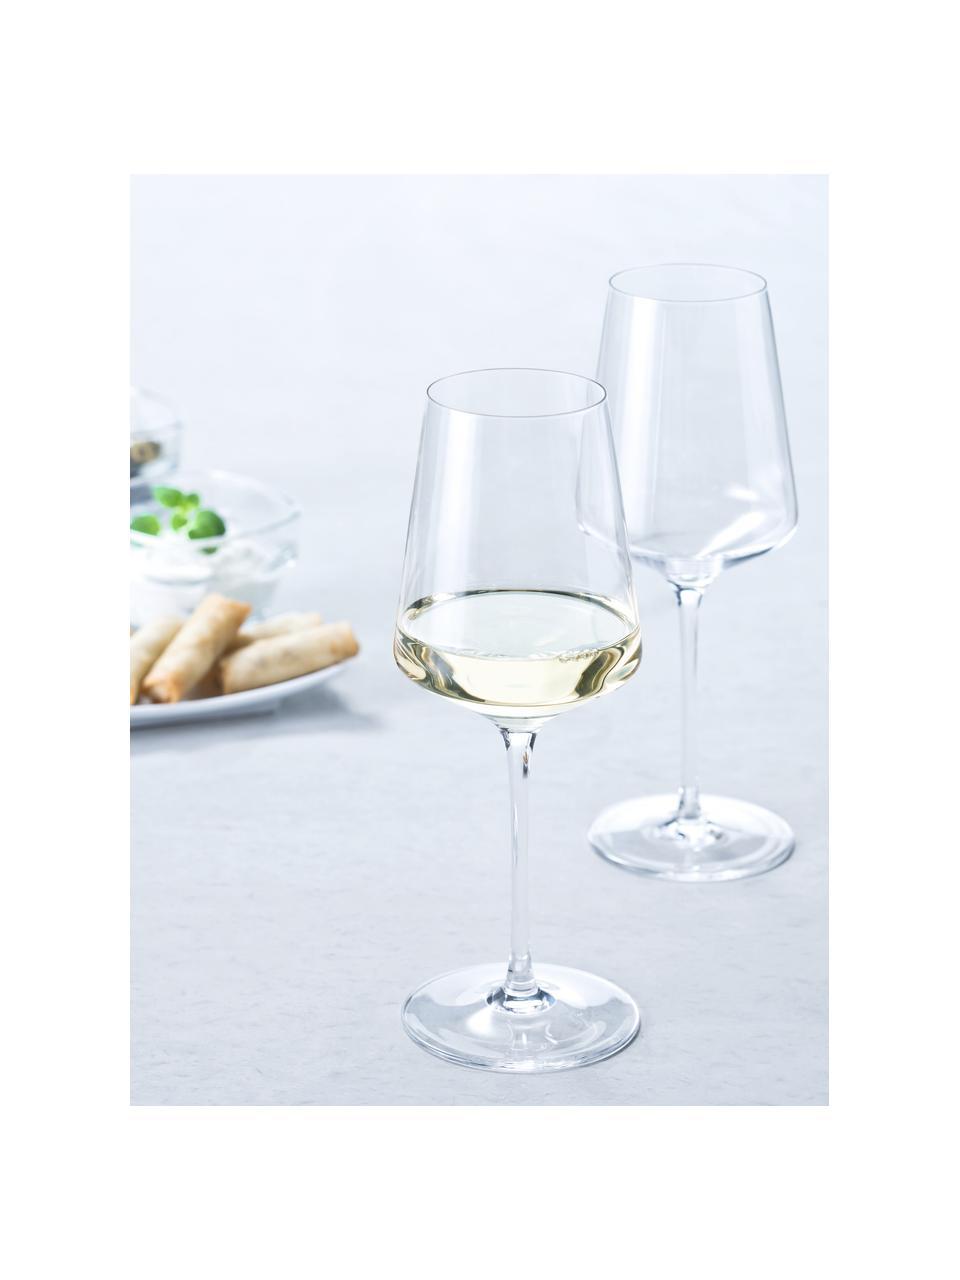 Weißweingläser Puccini, 6 Stück, Kristallglas, Transparent, Ø 10 x H 24 cm